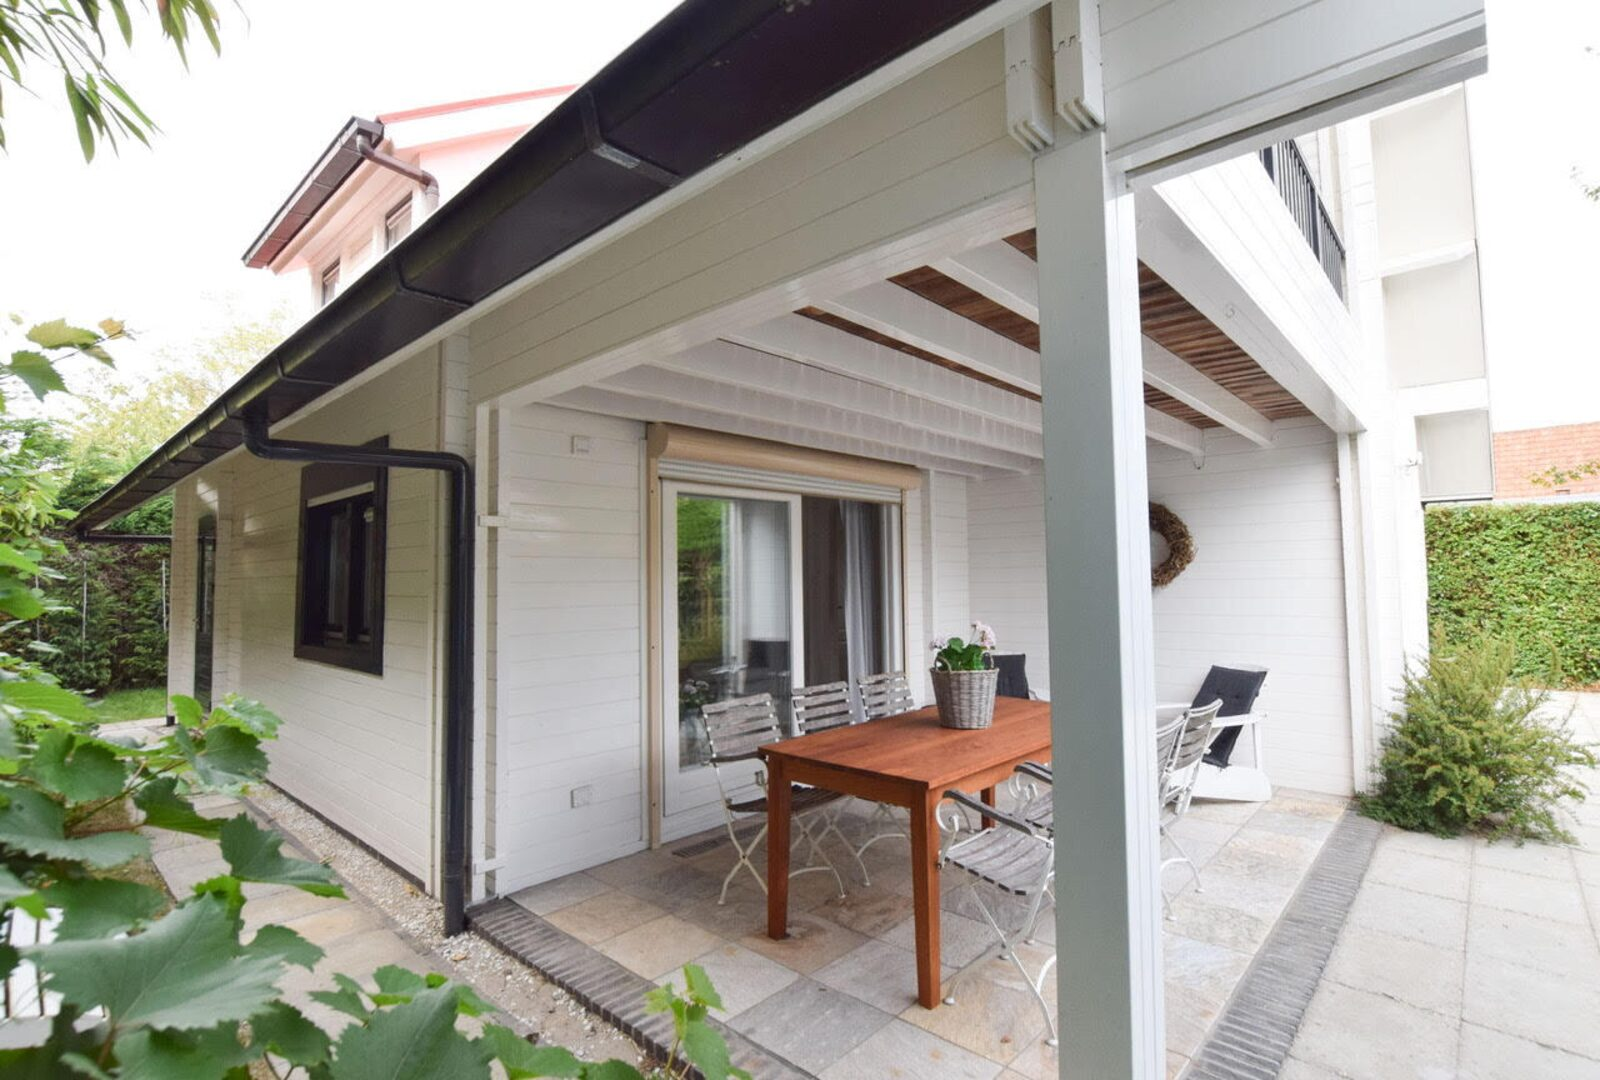 Ferienhaus - Hoge Weide 64 | Oostkapelle